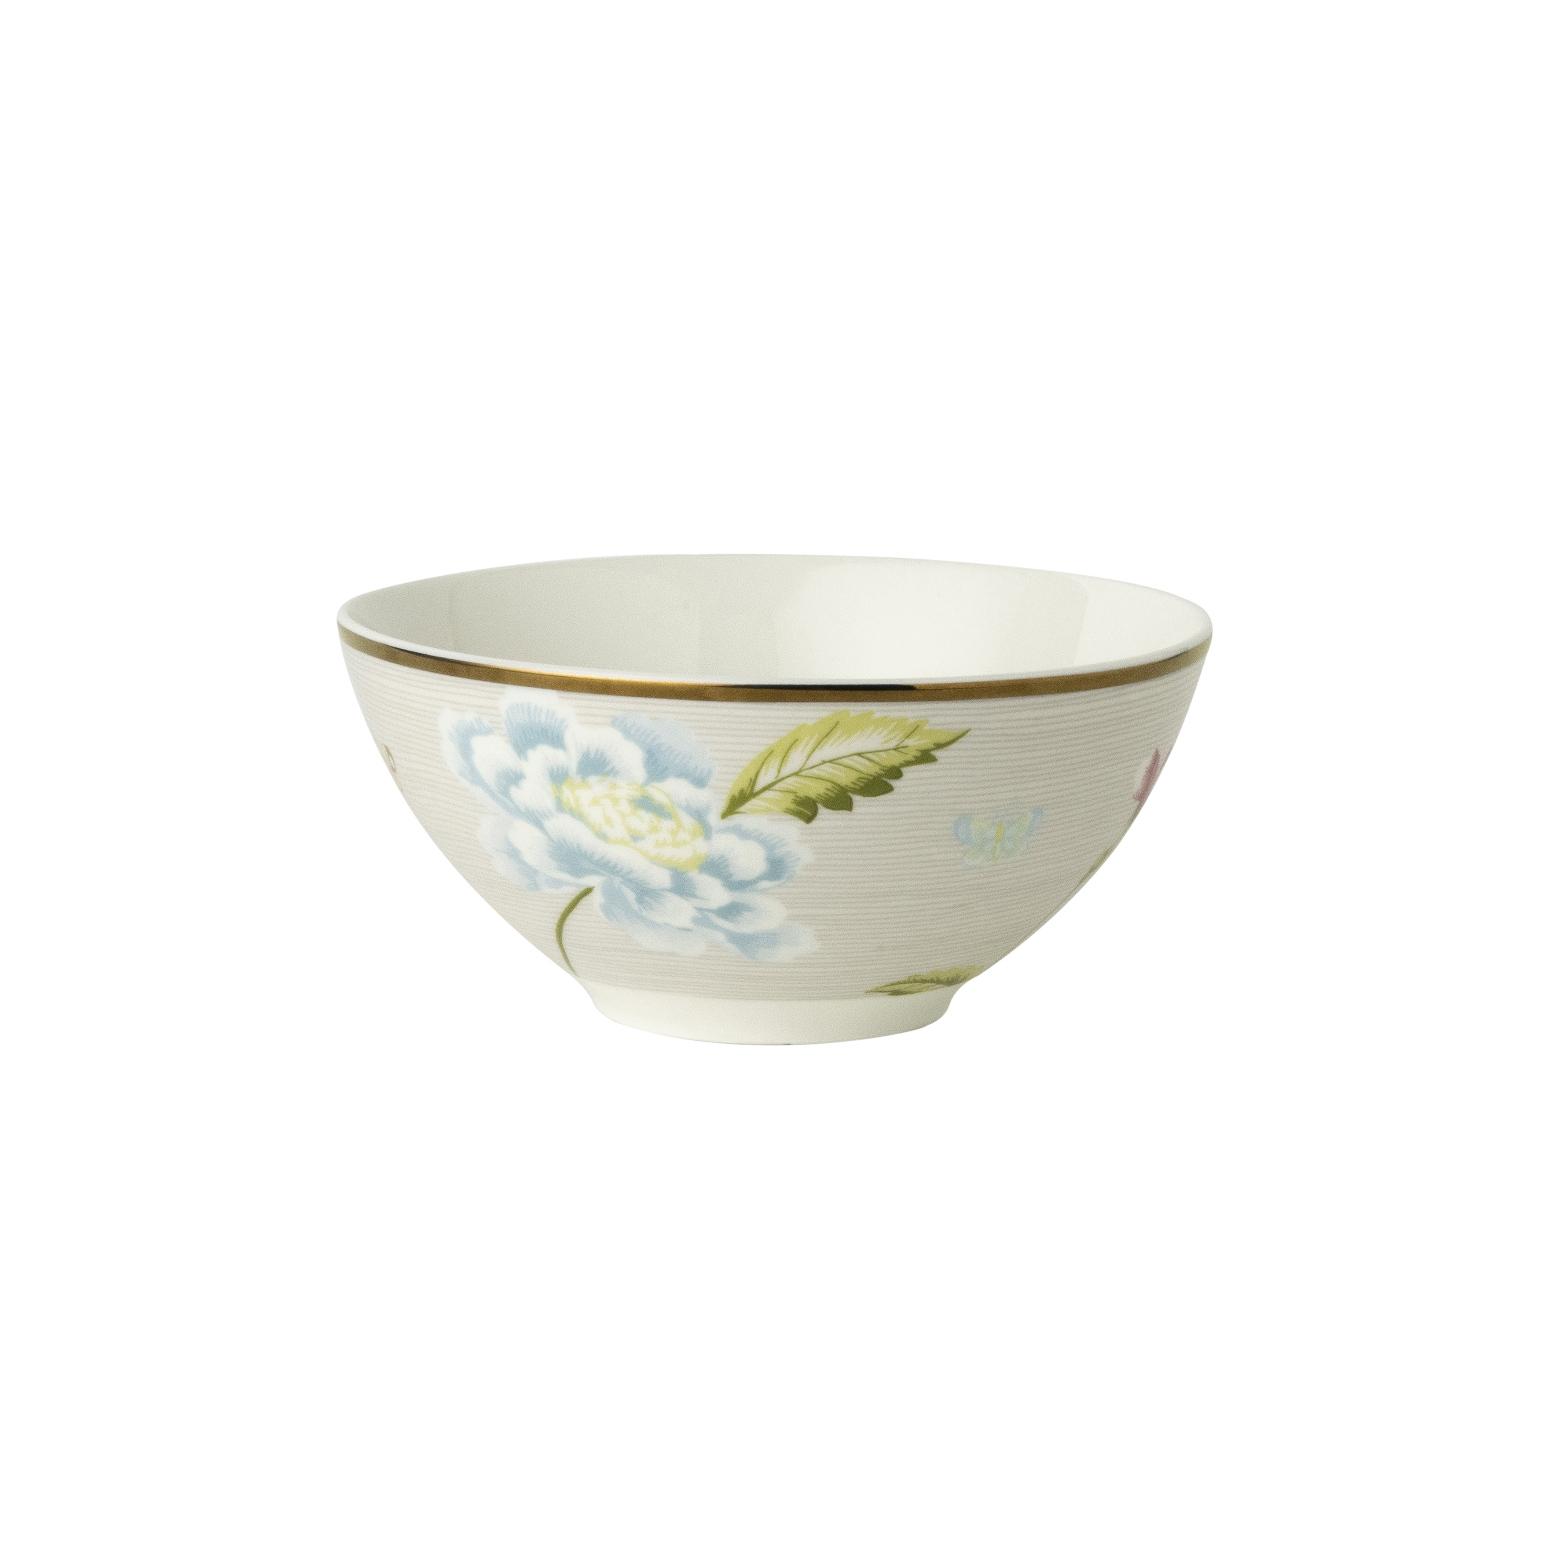 "Онлайн каталог PROMENU: Пиала ""Цветы"" Laura Ashley HERITAGE, диаметр 13 см, серый с цветком                               180515"